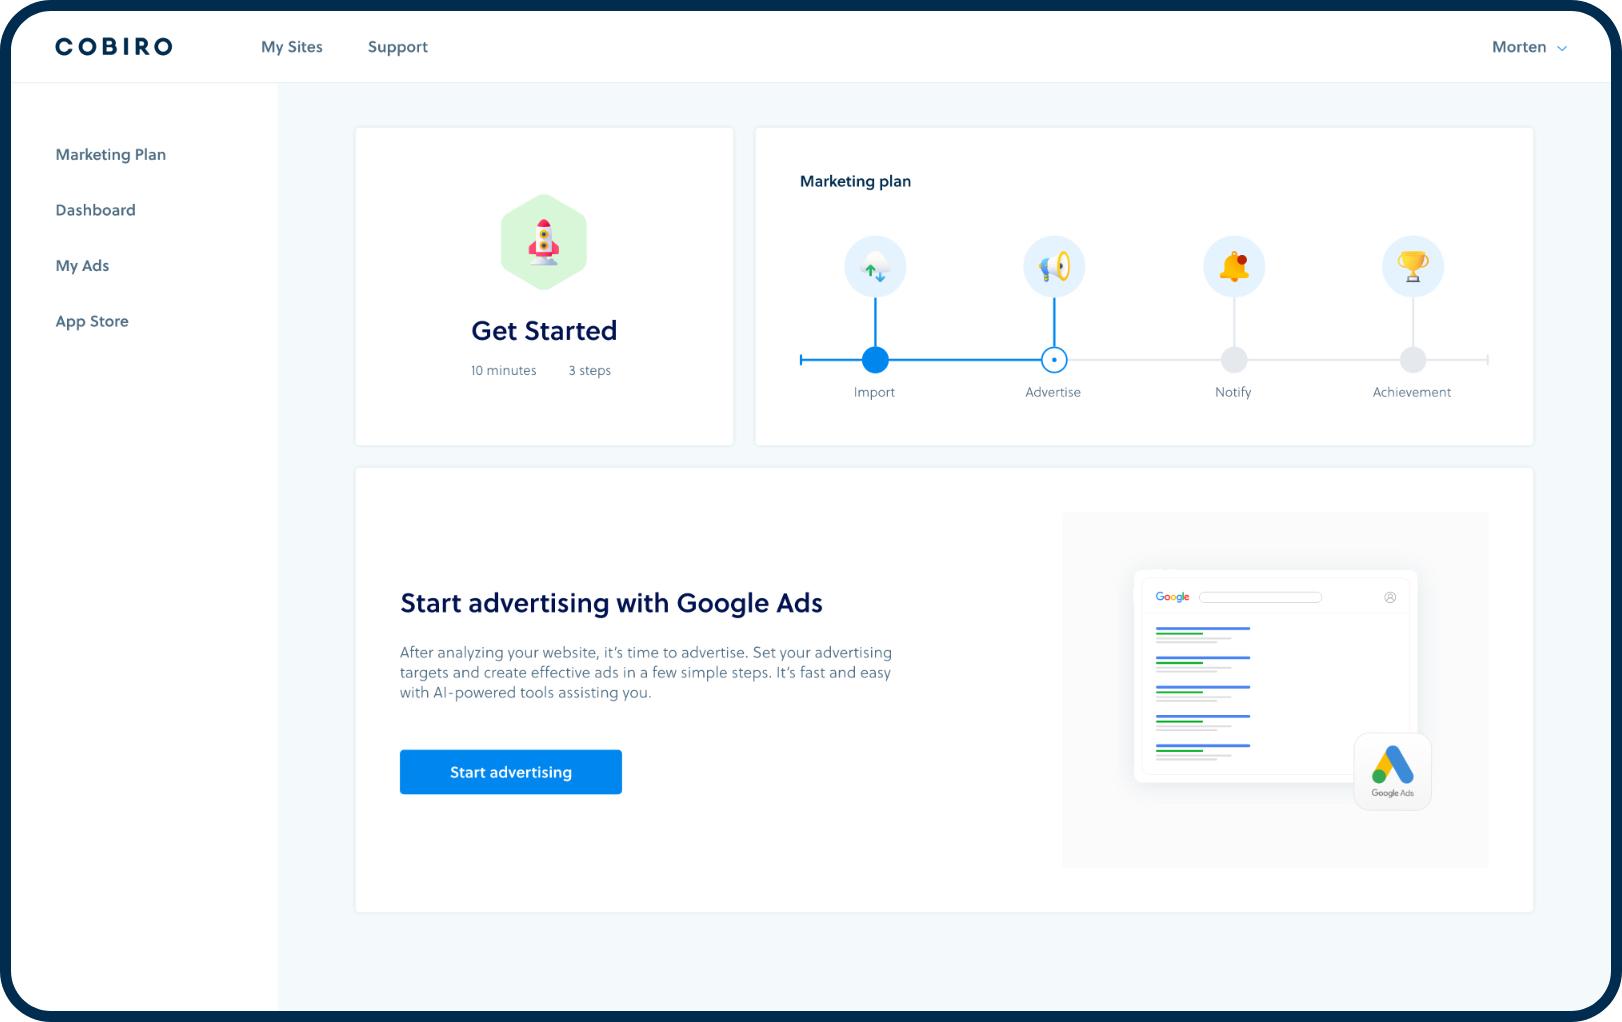 Step-by-Step Marketing Plan